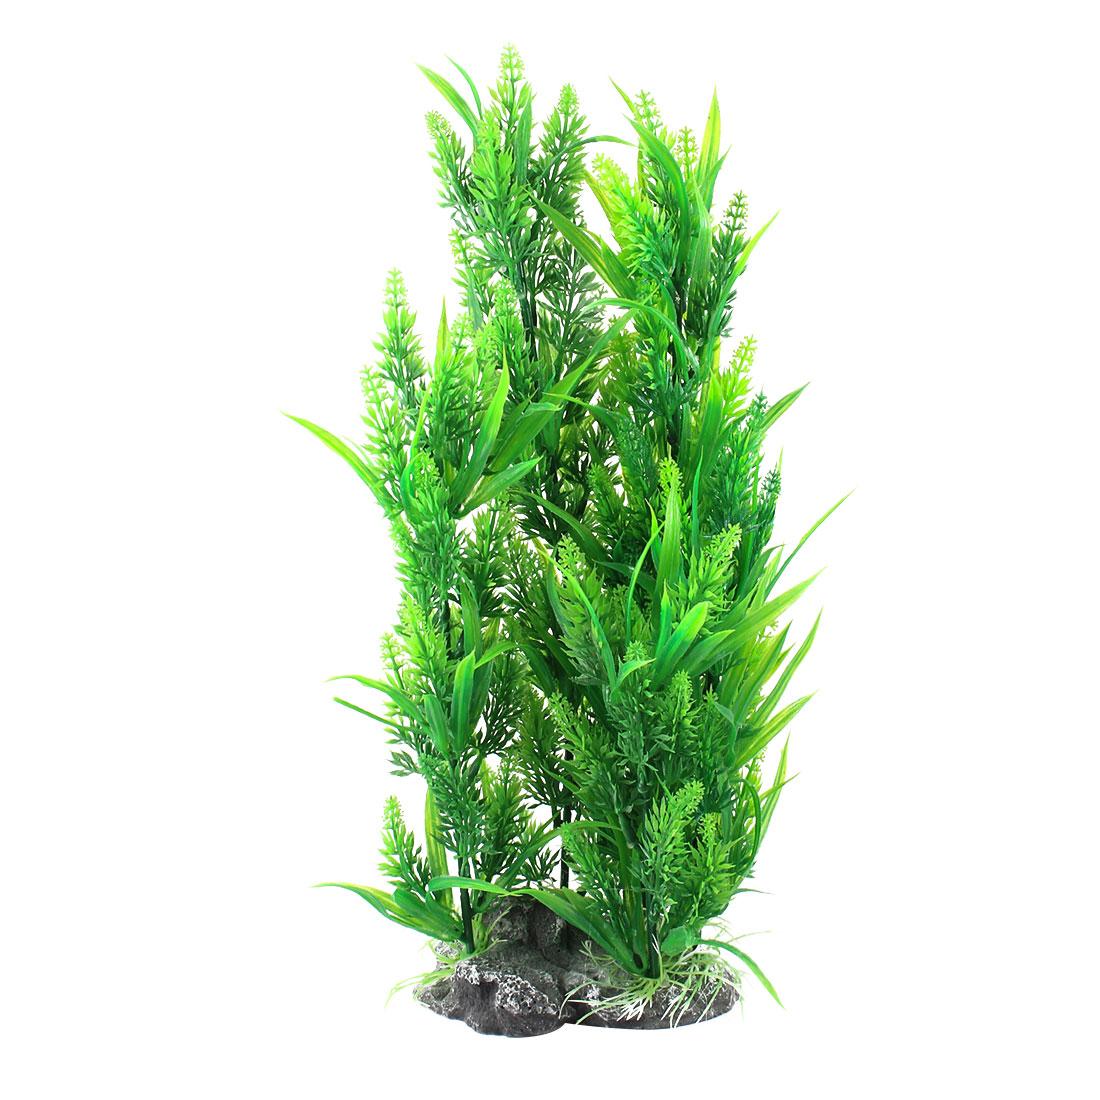 "Green Reed Grass Aquarium Emulational Plastic Plant Decor 15.7"" High"